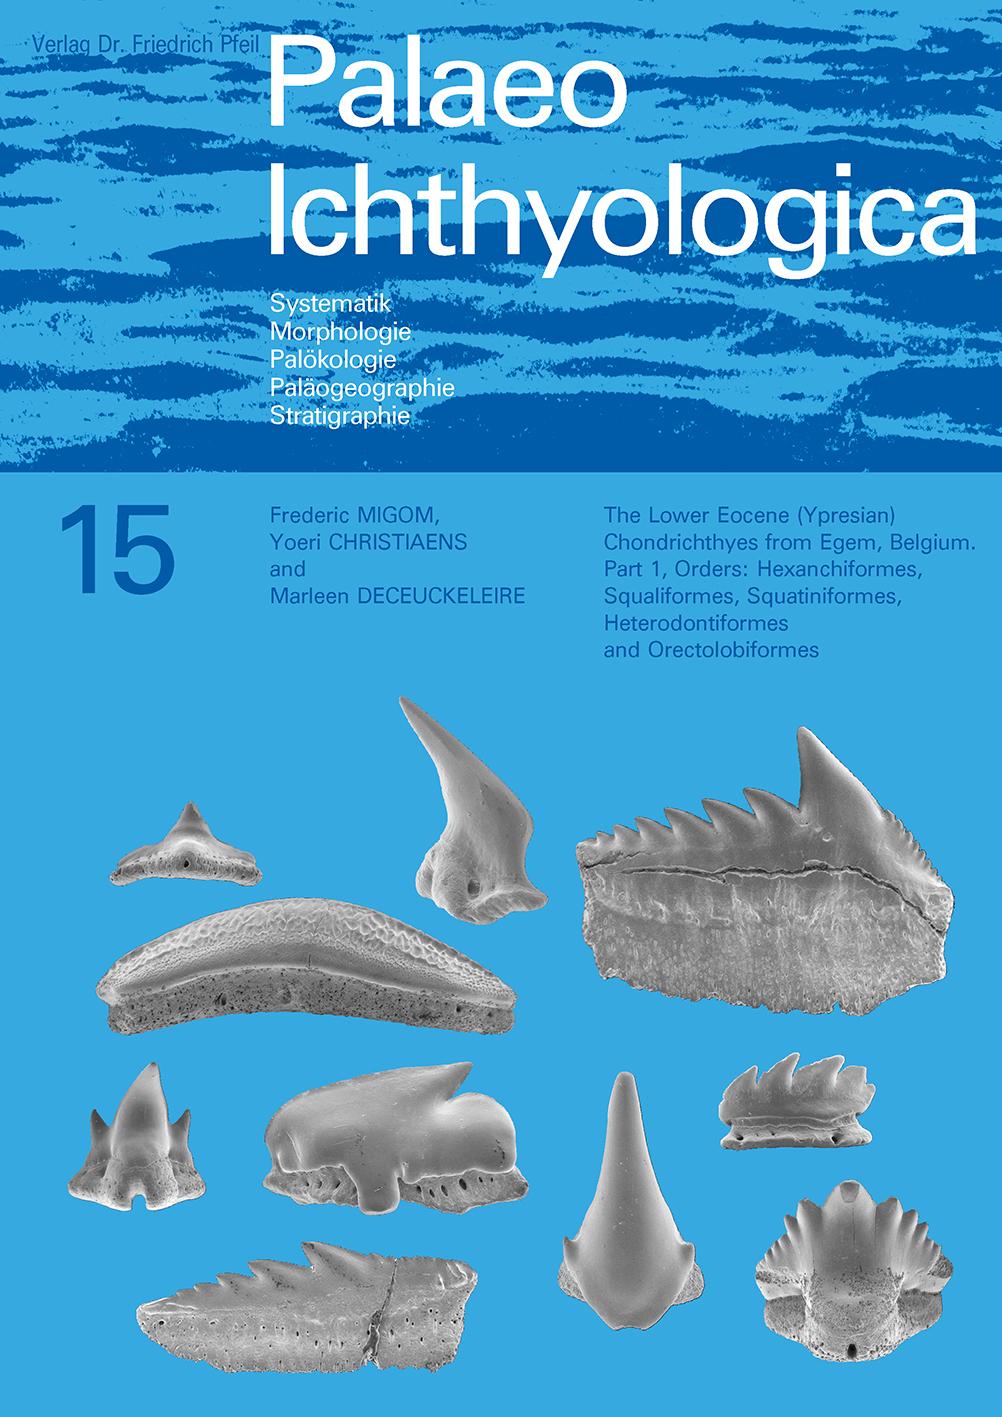 The Lower Eocene (Ypresian) Chondrichthyes from Egem, Belgium